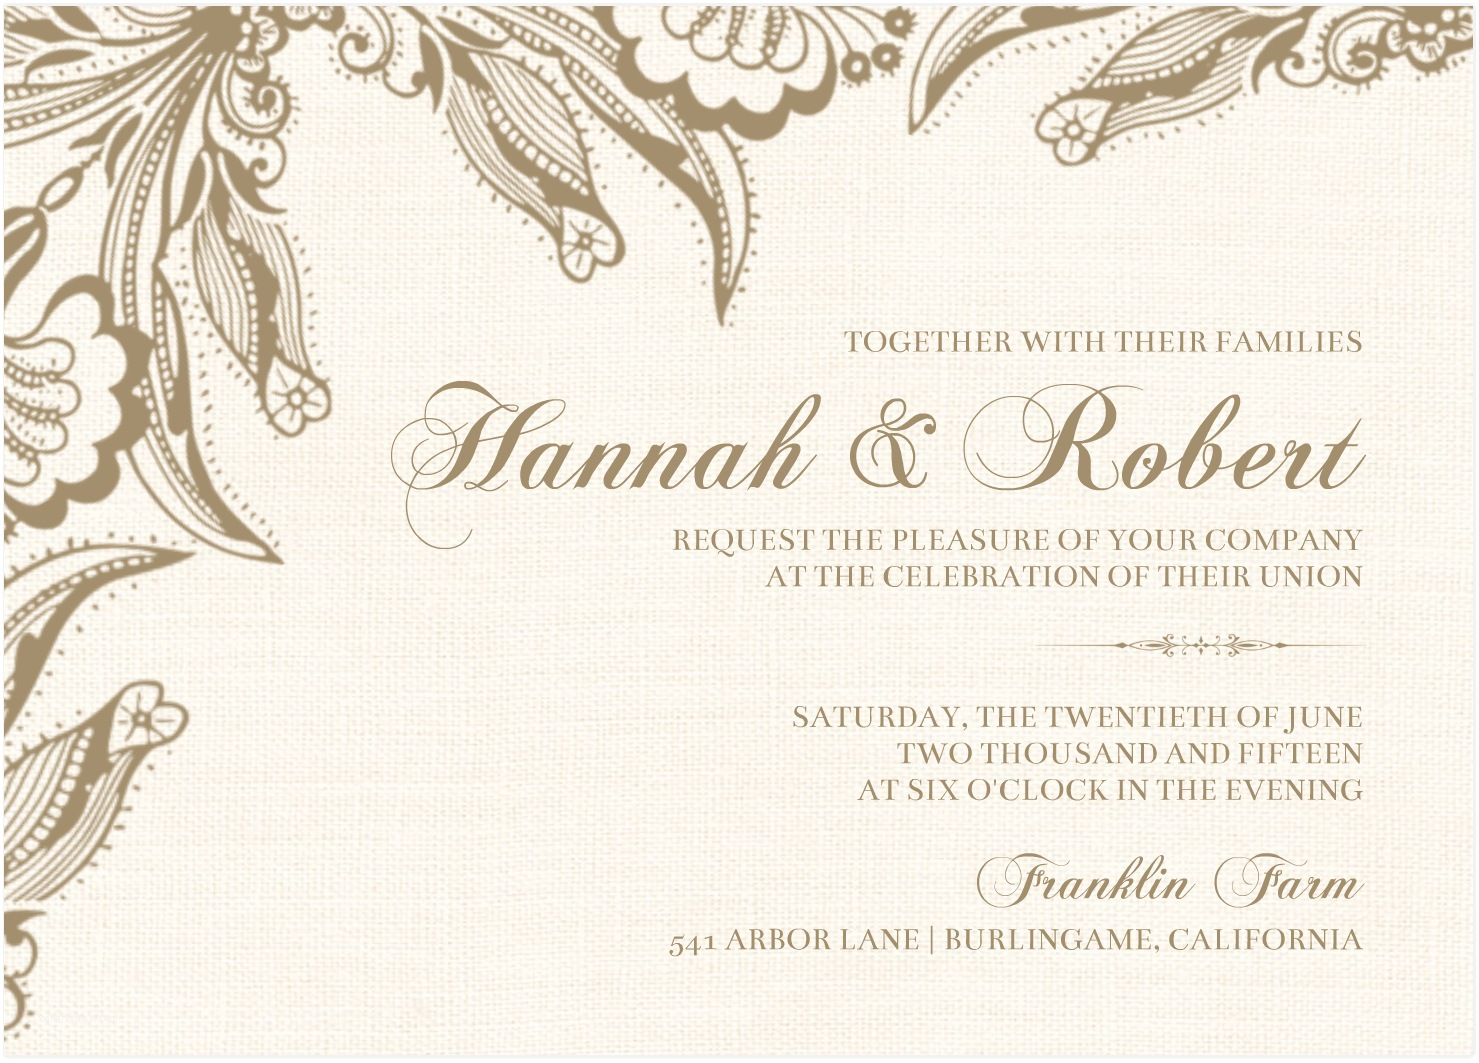 Wedding Invitation Designs Inspirational Wedding Invitation Card Design Samples